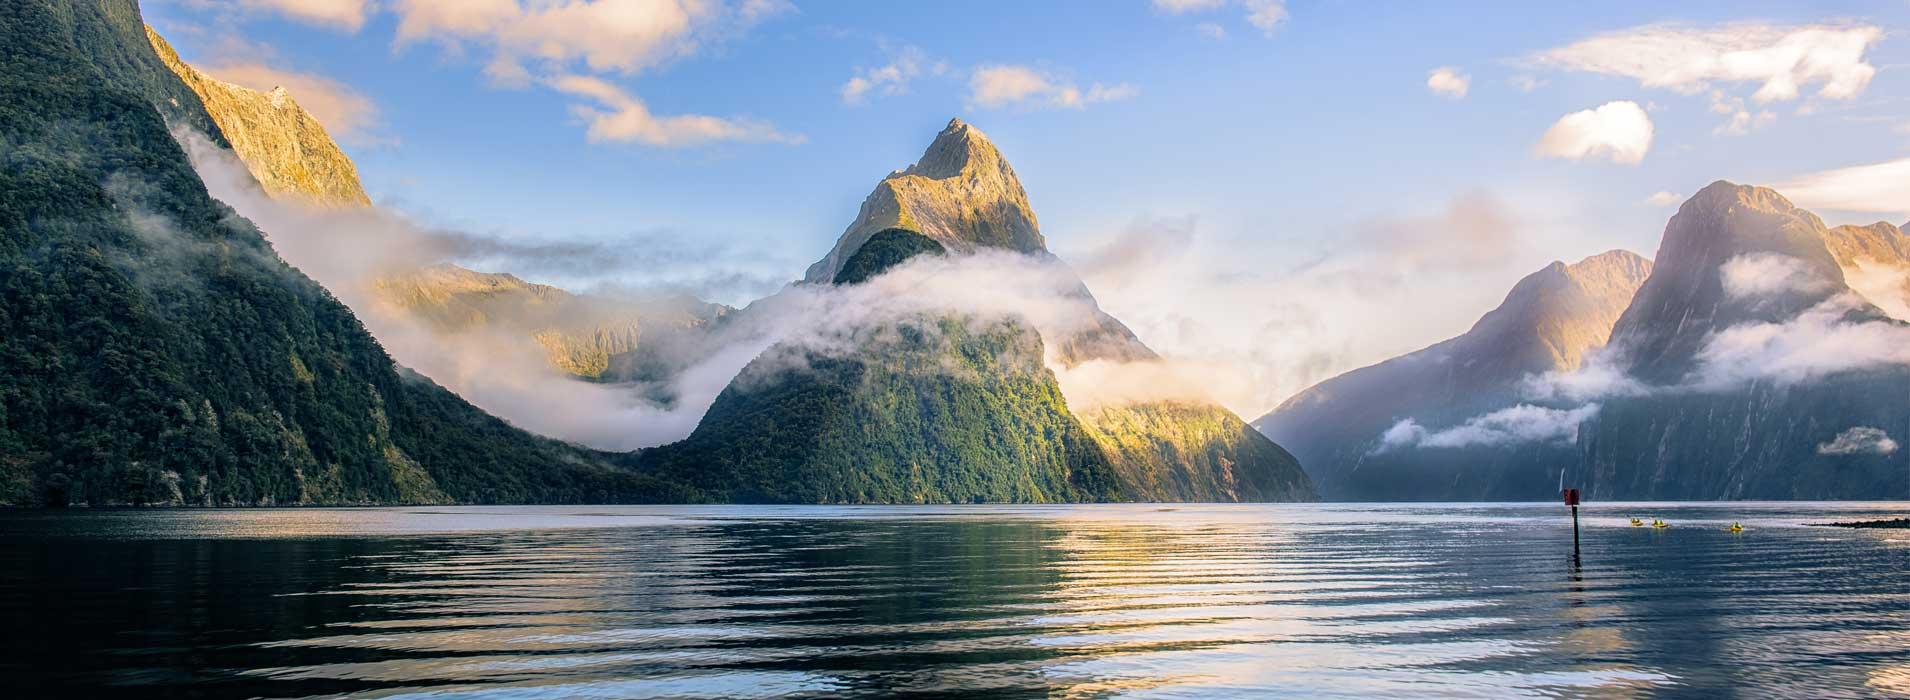 Australia & New Zealand Itineraries